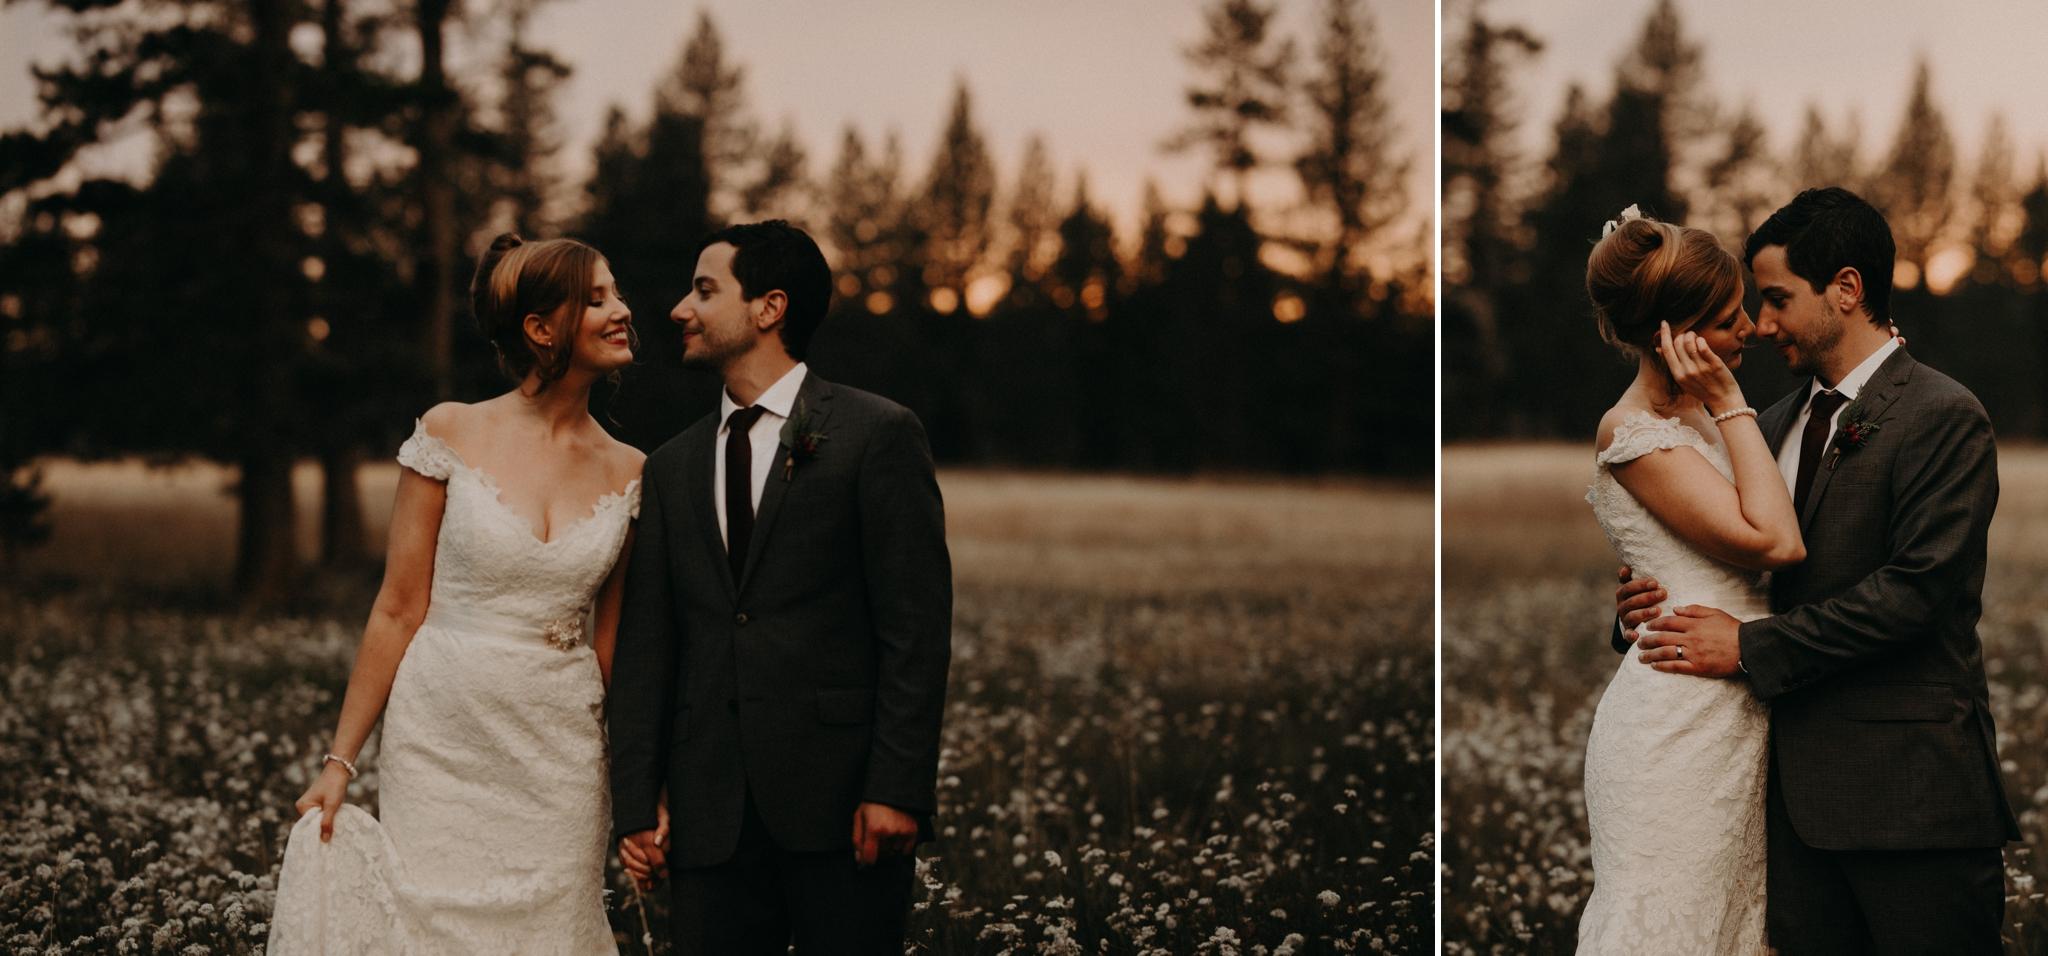 tahoe-wedding-photographer13.jpg